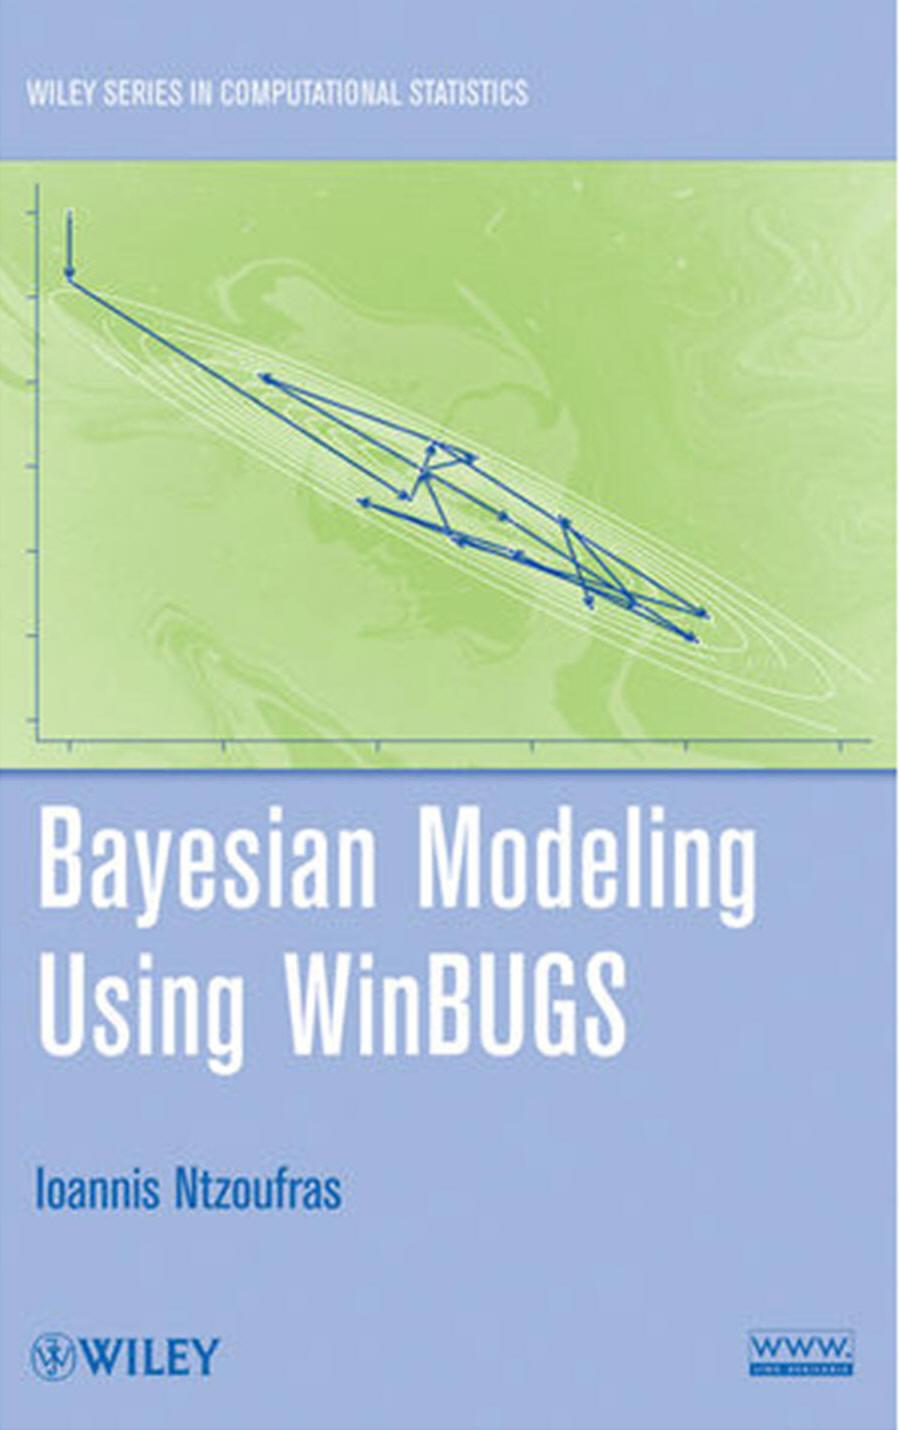 bayesian modeling using winbugs ioannis ntzoufras pdf